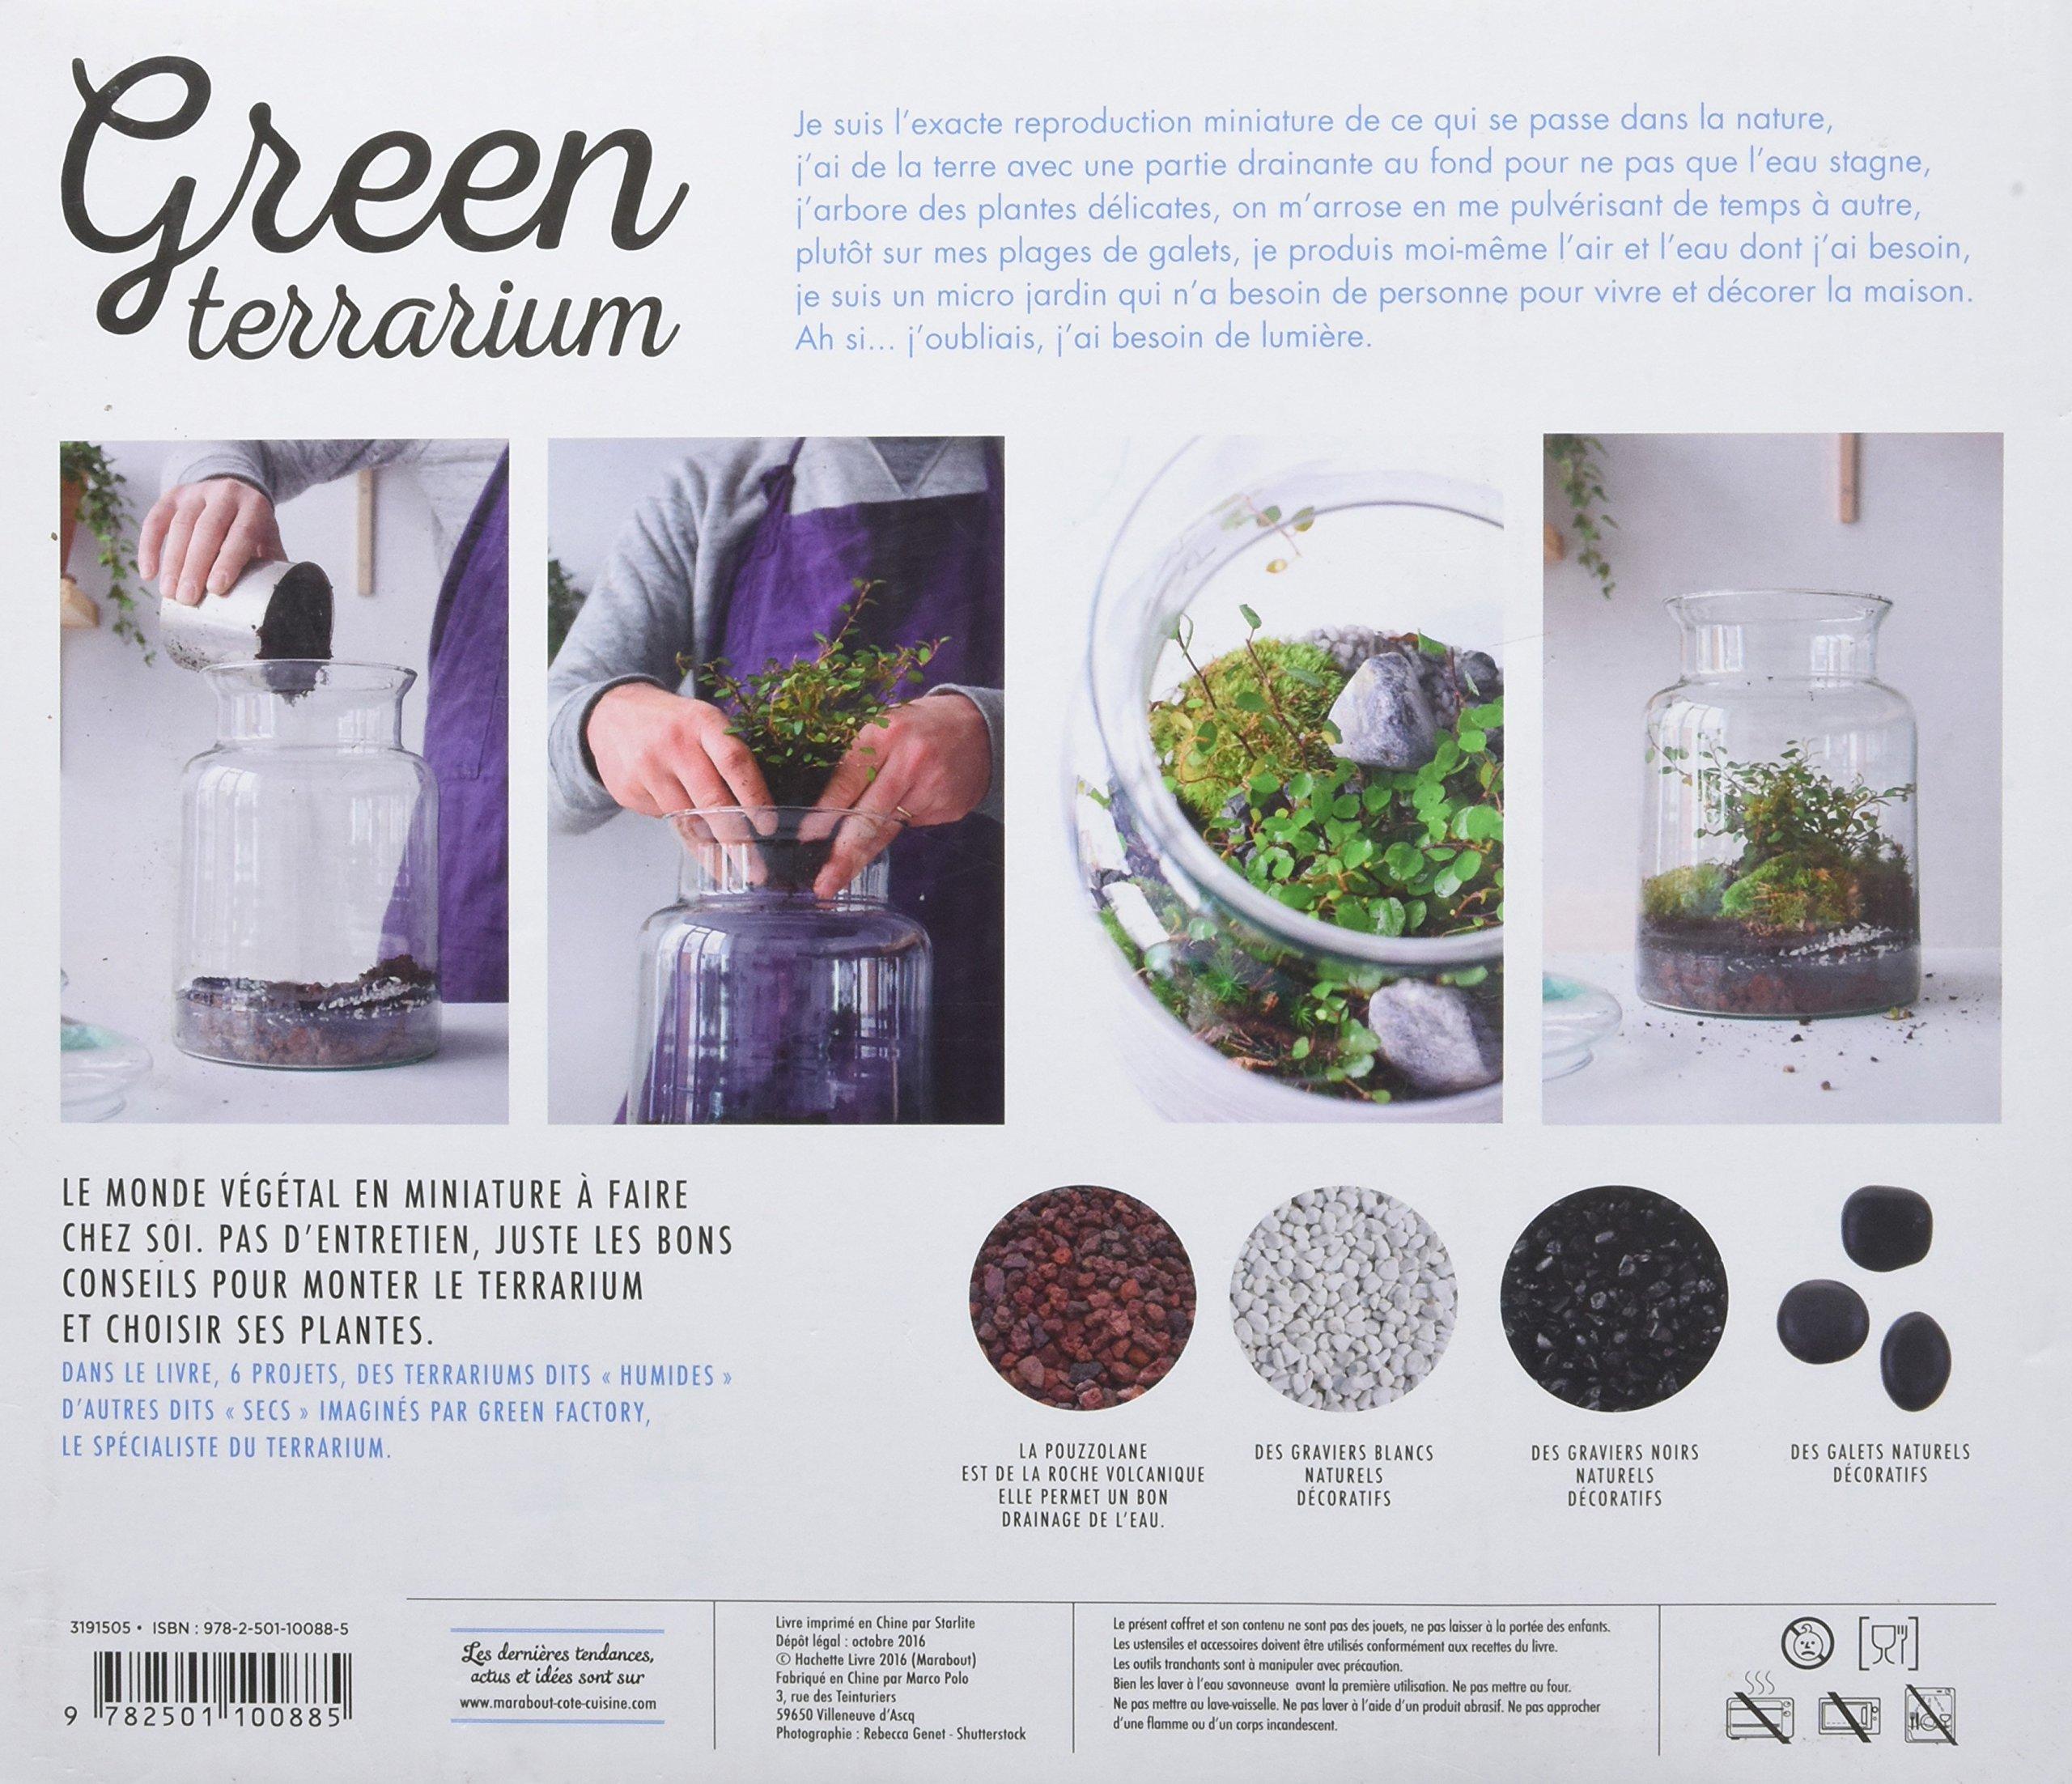 Green Terrarium Contient Un Terrarium En Verre Amazon Co Uk Noam